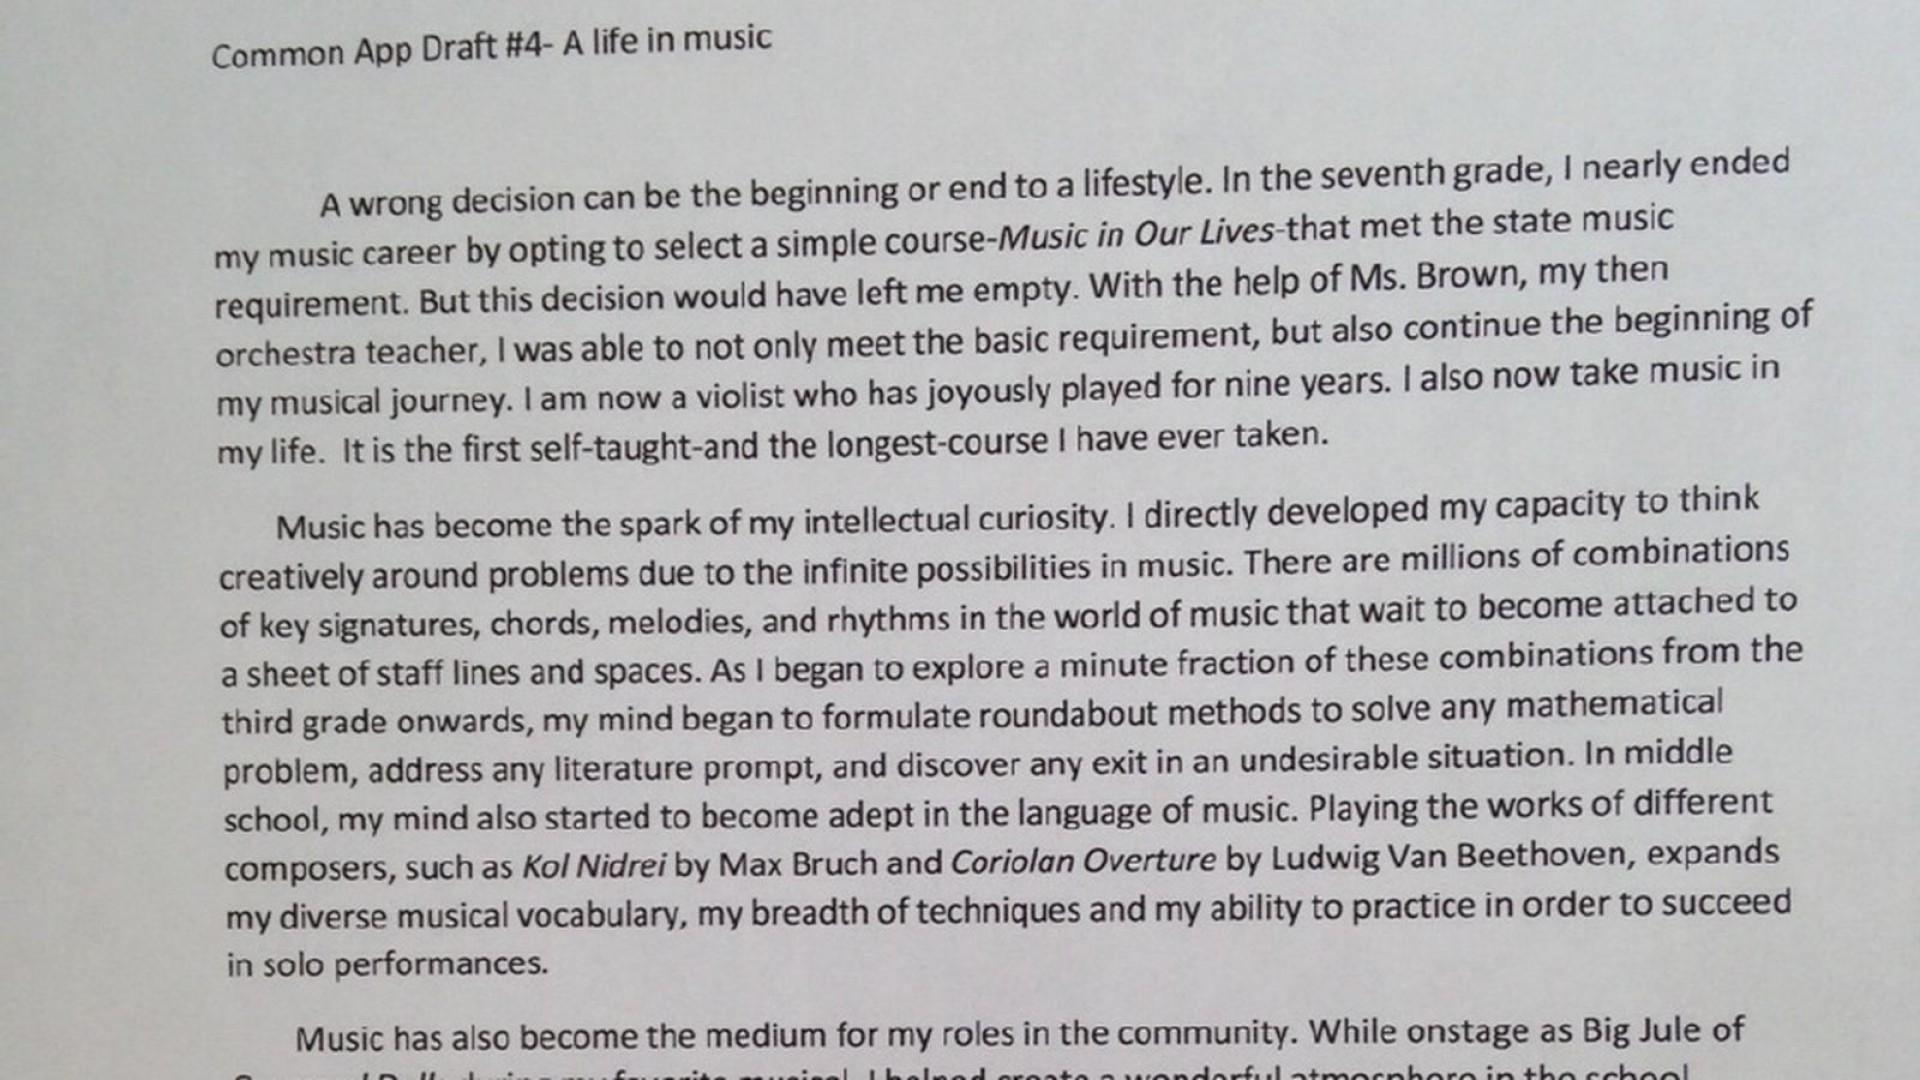 001 Mzbjnwjhyzu5mcmvrjrdbvjja0tbuupyc0gwohzwuldmahvsohrbps8wedk2ojkwm3g2njuvmtywmhg5mdavzmlsdgvyczpmb3jtyxqoanblzyk6cxvhbgl0esg4mckvahr0chm6ly9zmy5hbwf6b25hd3muy29tl3bvbgljew1pyy1pbwfnzxmvodjimgi0zjq4ymq0 Archaicawful College Essay Examples Ivy League Admission 1920